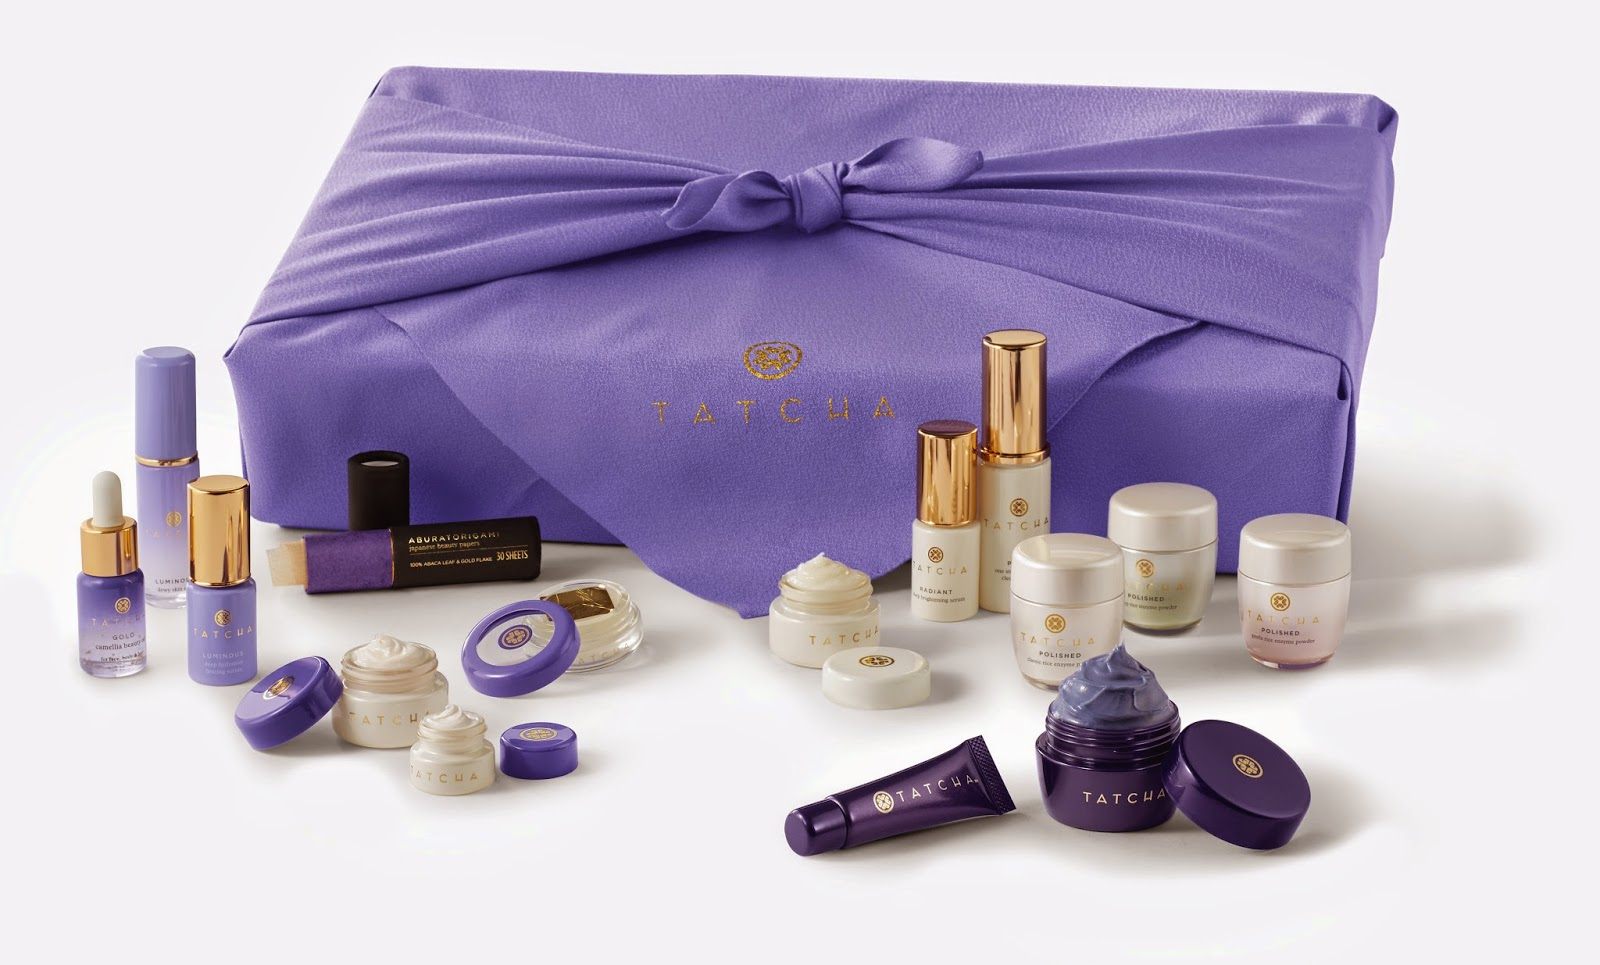 Tatcha-Kaiseki-Skincare-Gift-Set